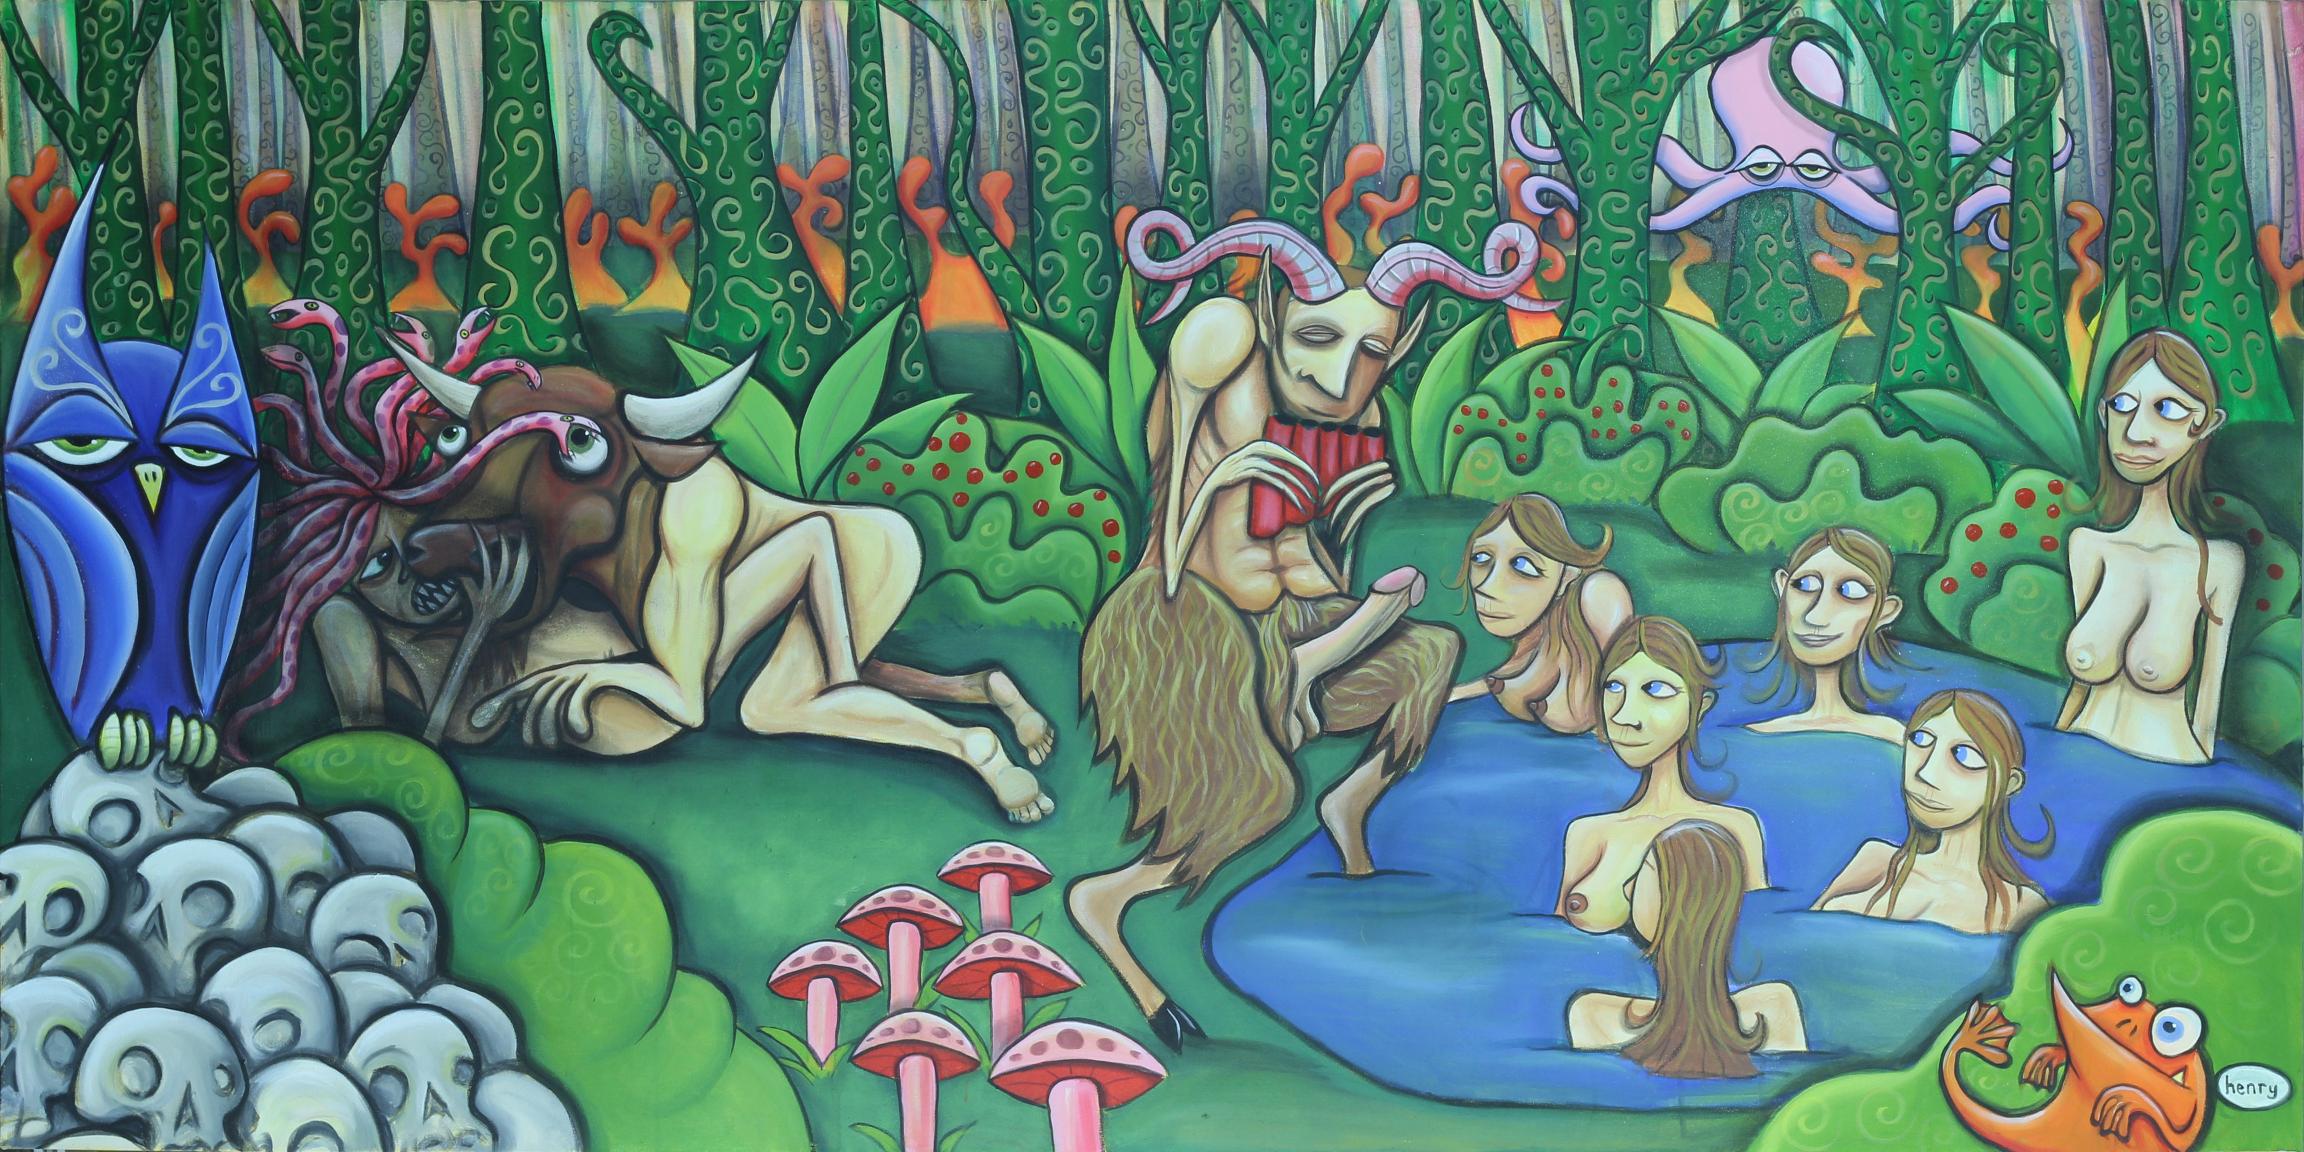 Pan's Nymphomania. acrylic on canvas .10' x 5'